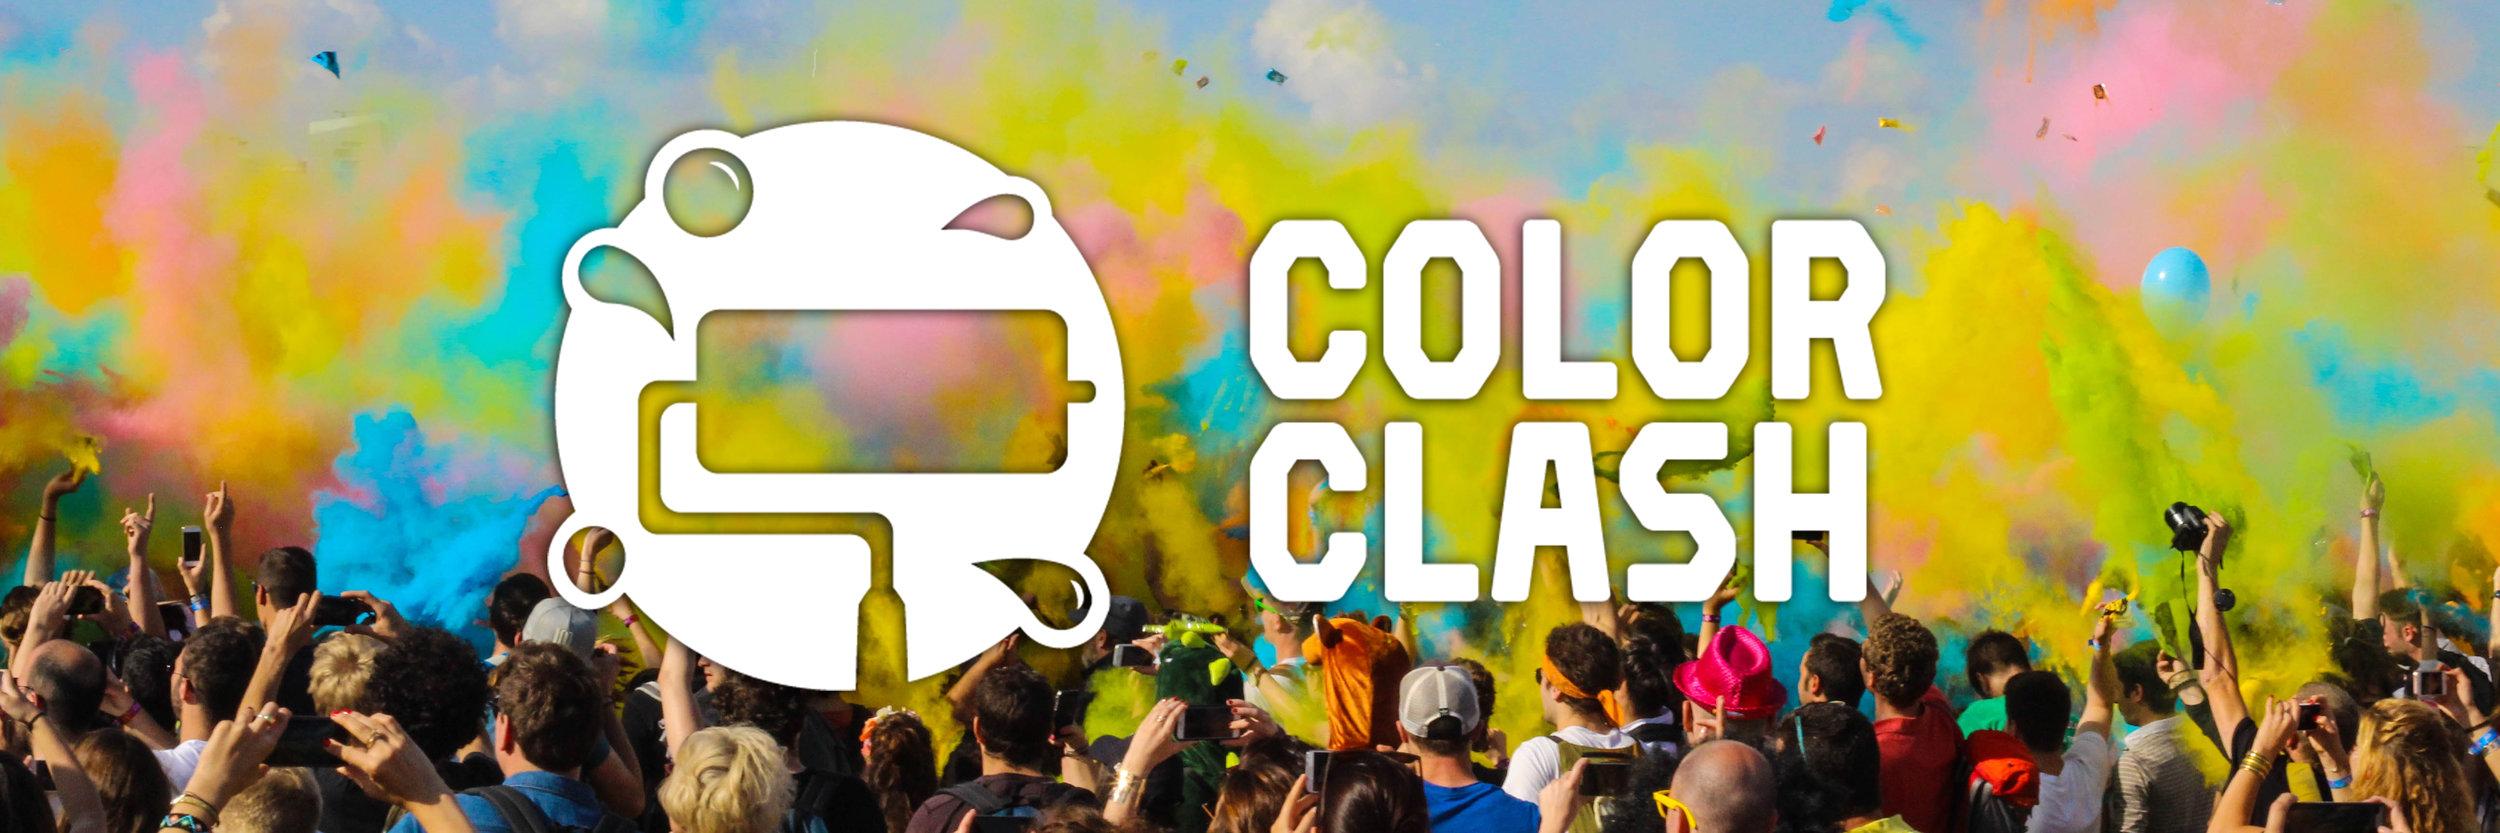 Color Clash 3x1.jpg